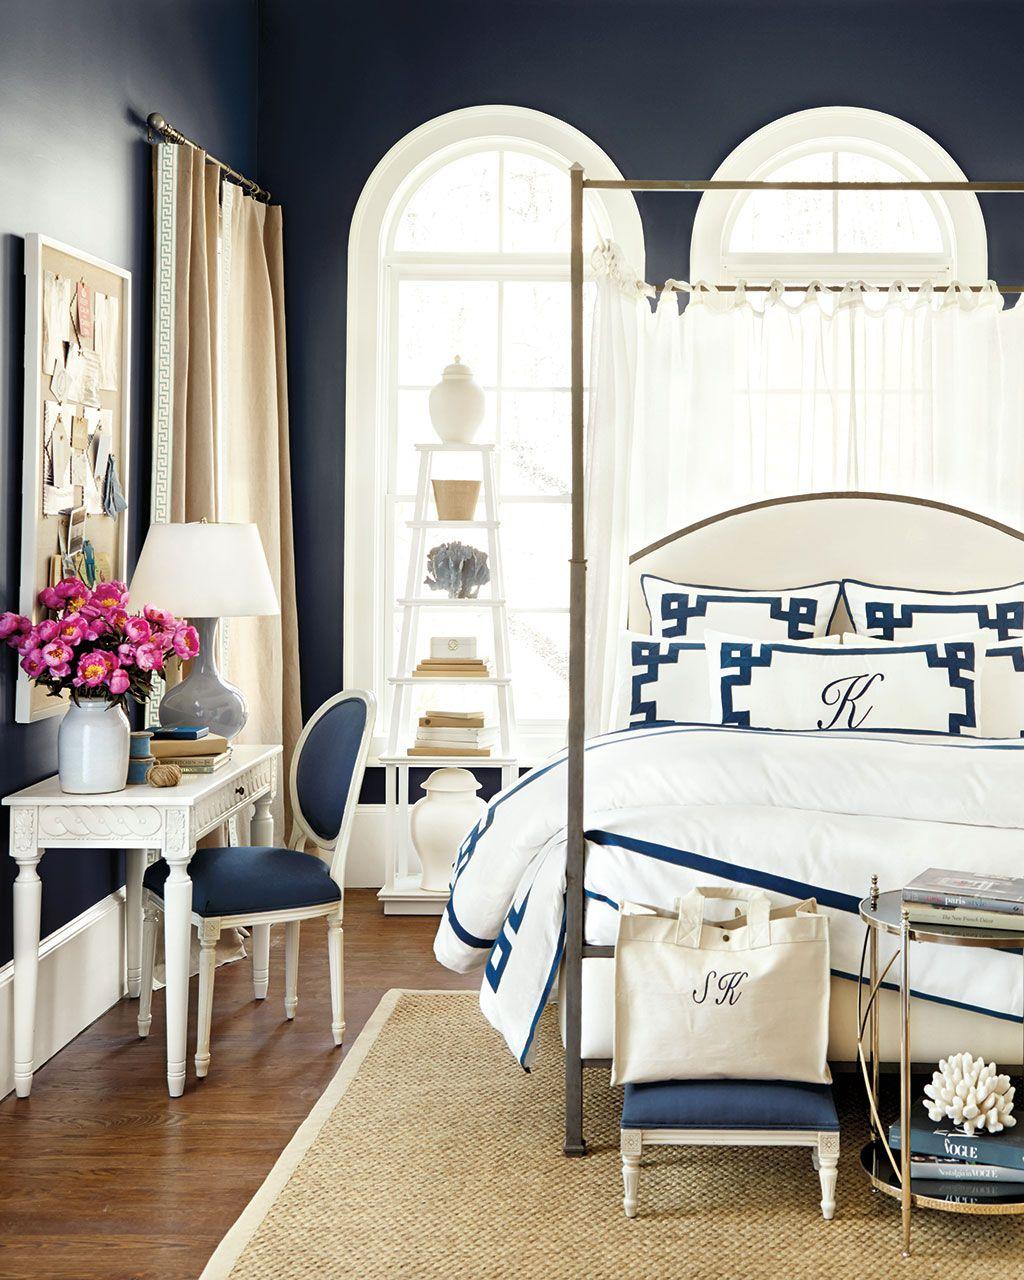 Dark paint ideas for bedroom  Dark Paint Color Inspiration for Your Room  Dark paint colors